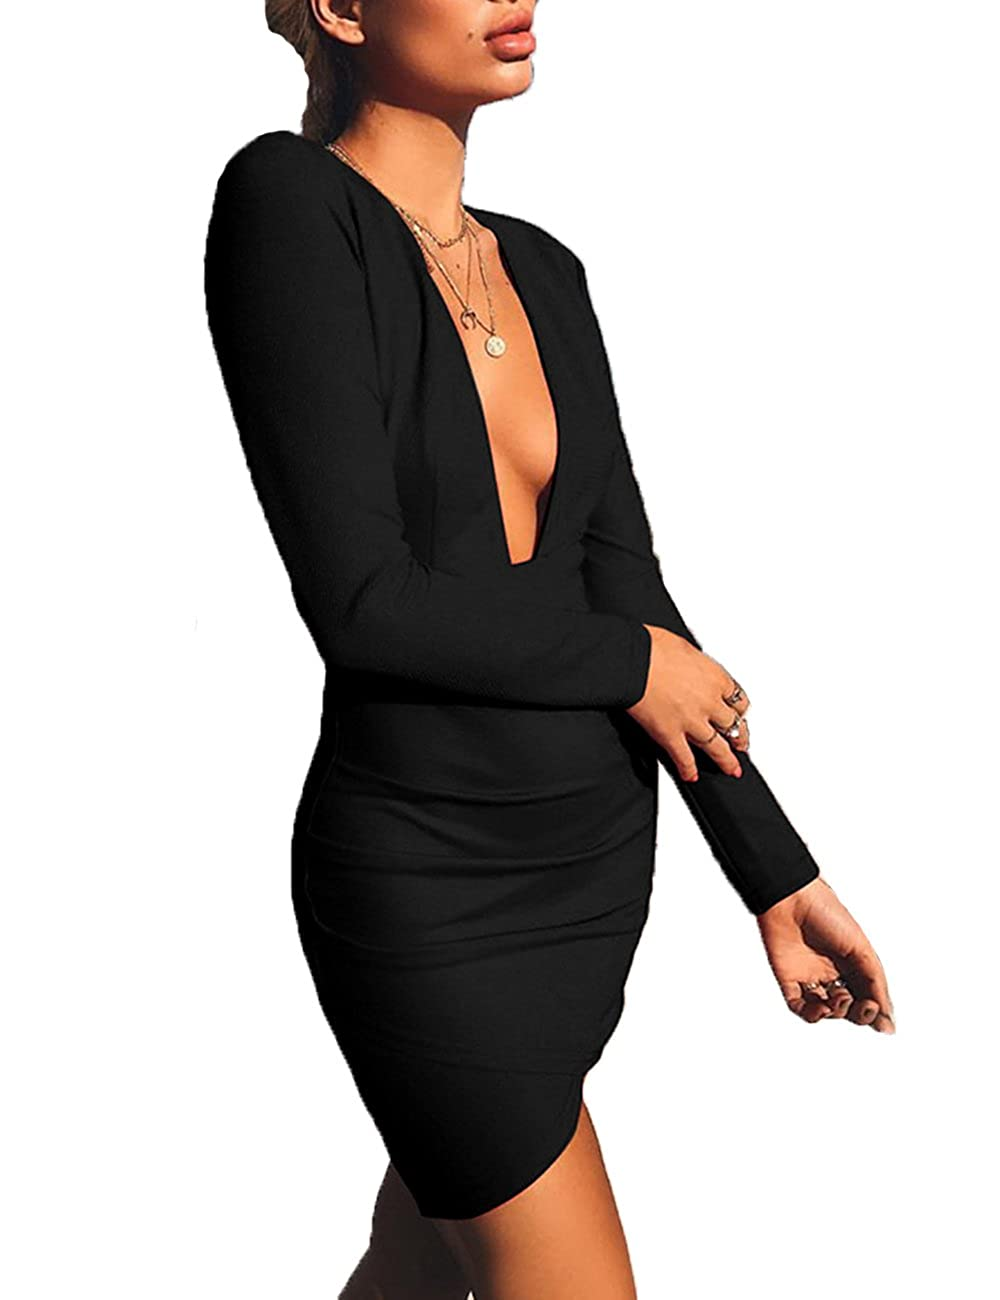 UZZDSS Women s Deep V Neck Hollow Backless Bodycon Dress Long Sleeve Sexy  Club Party Dresses at Amazon Women s Clothing store  9ba1104aa